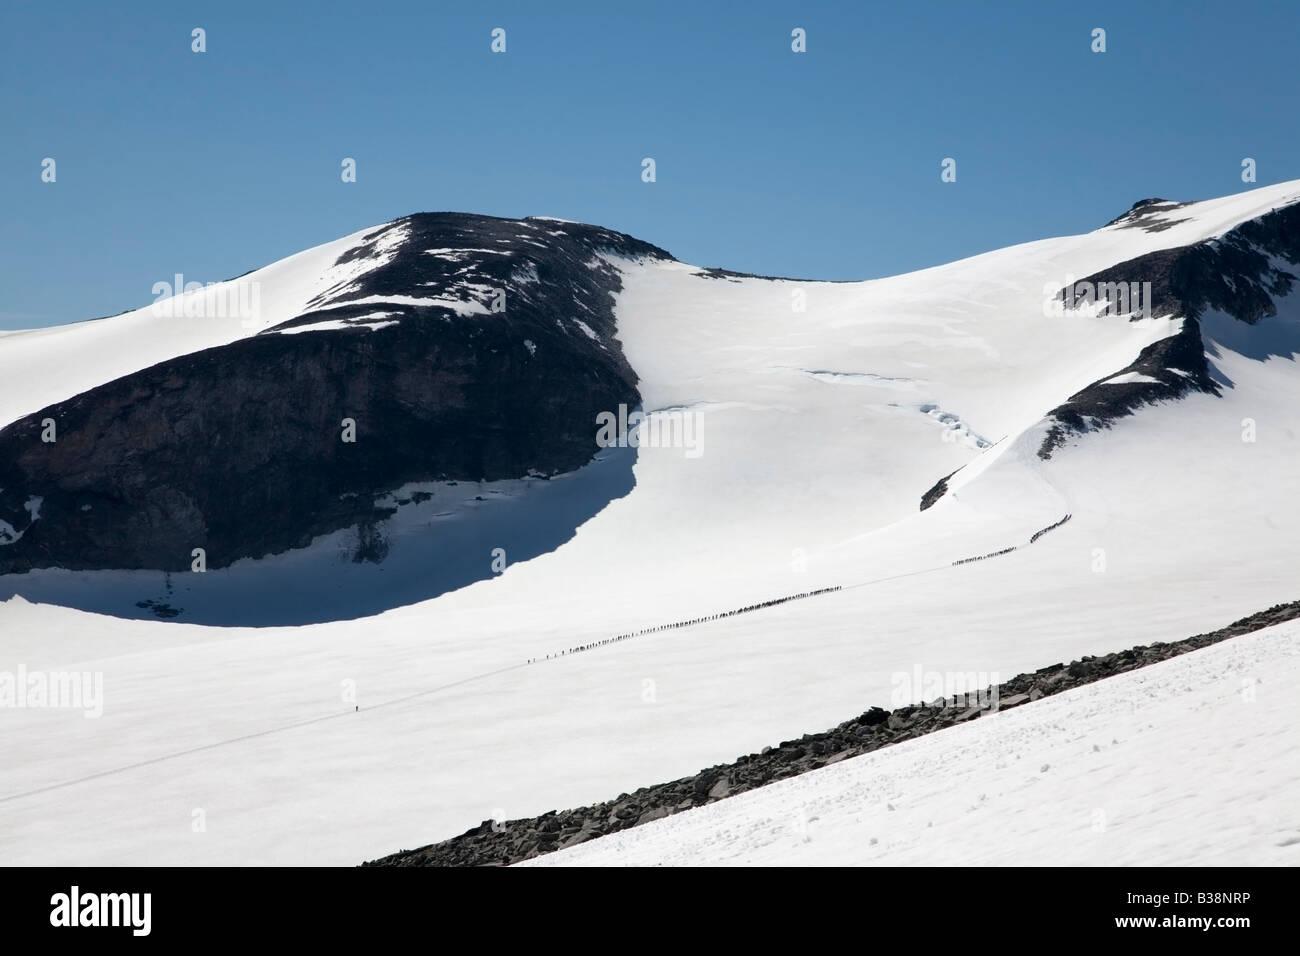 Norway Jotunheimen fjell Galdhöpiggen tourists on glacier summer 2008 - Stock Image